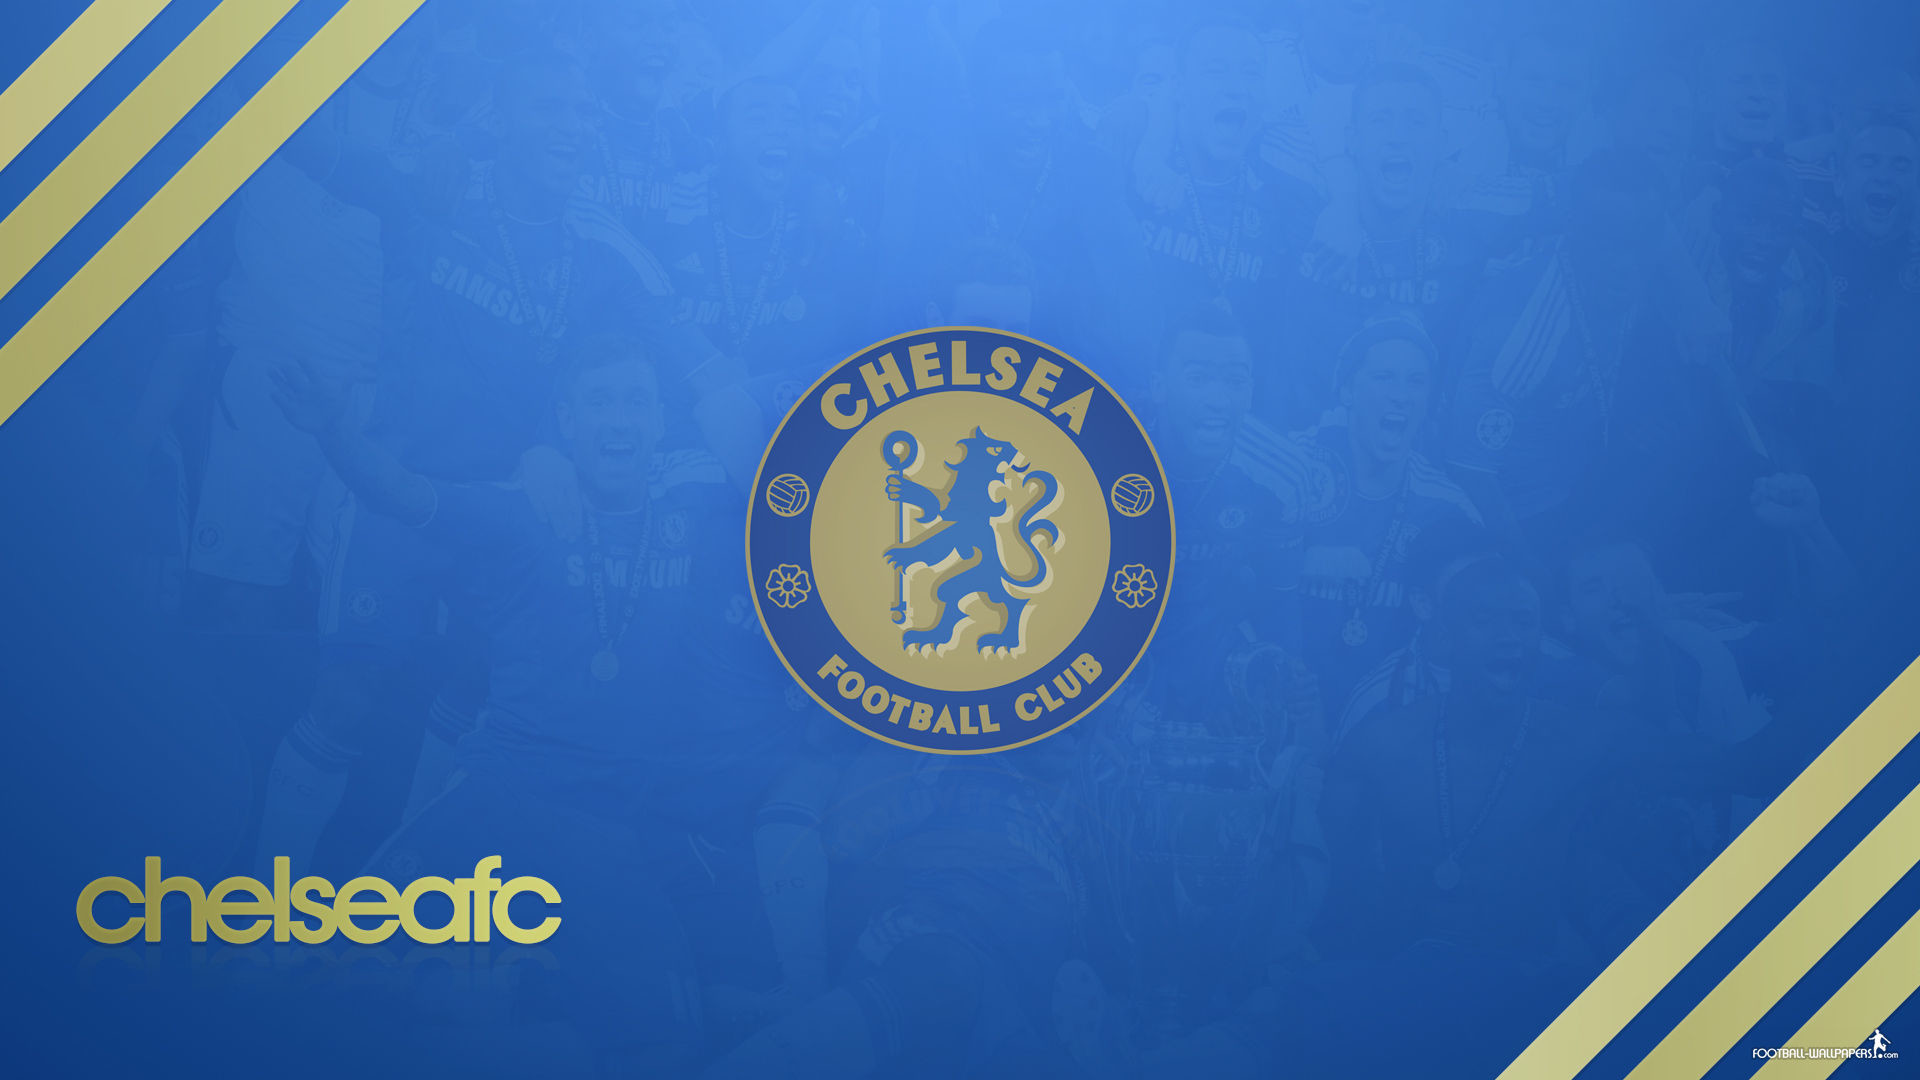 Res: 1920x1080, Chelsea Fc Champions League. Wallpaper ...